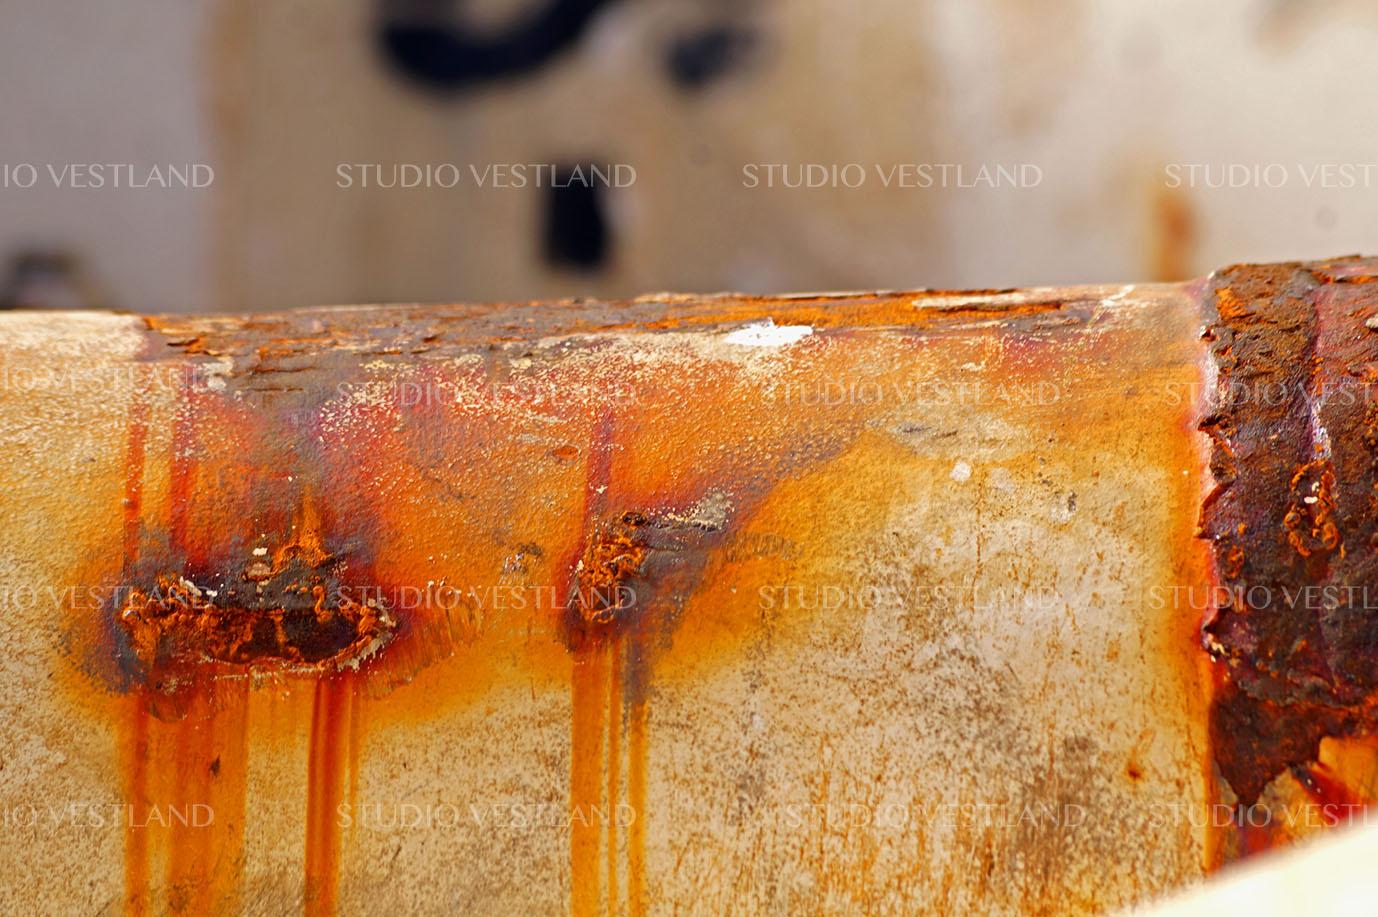 Studio Vestland - Sprekk 08